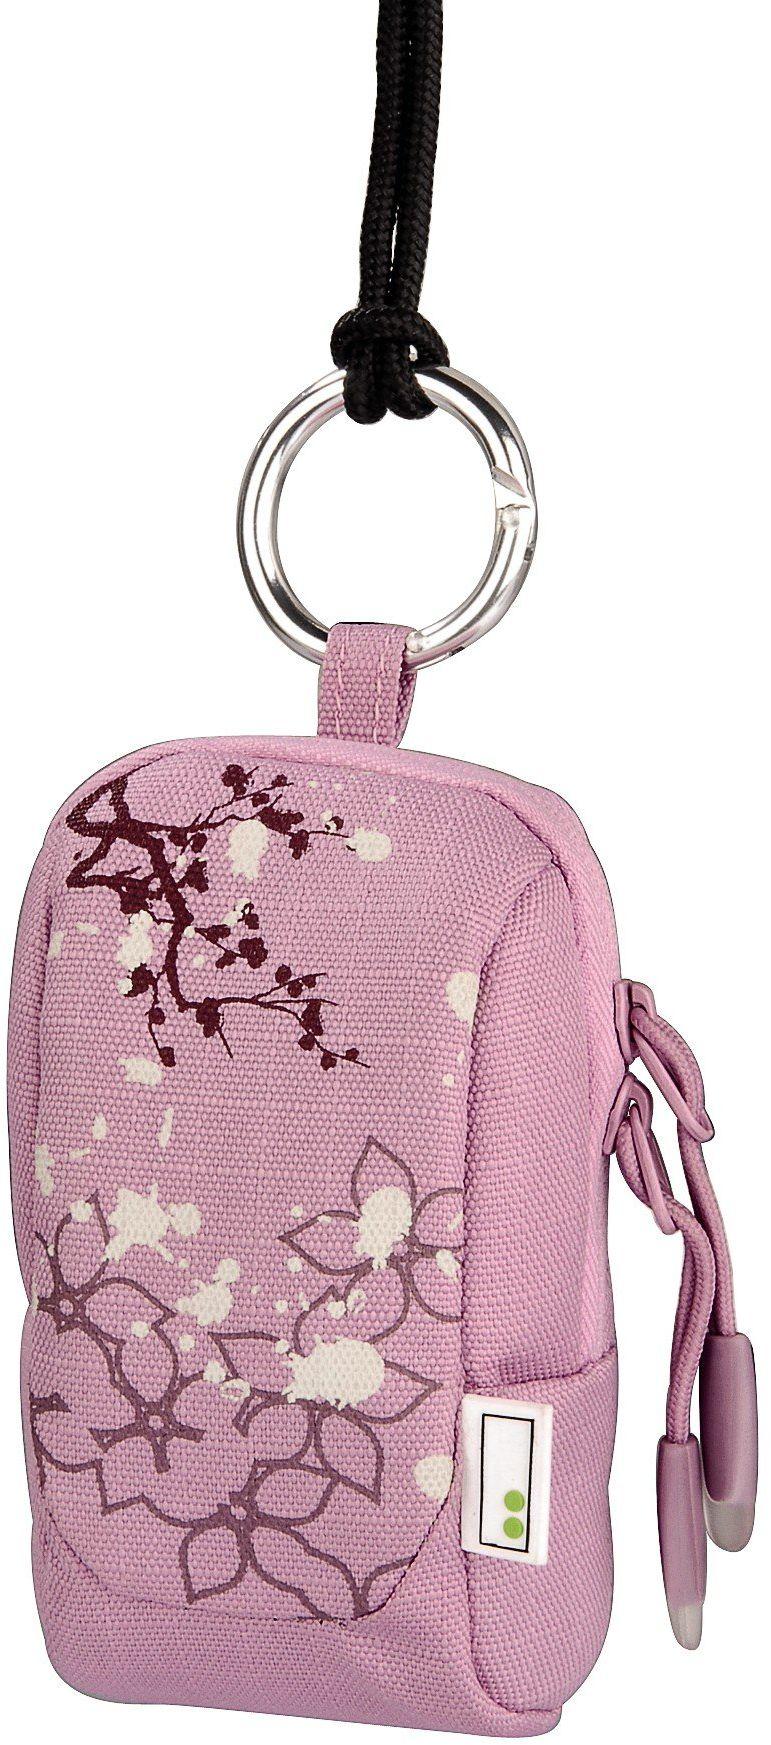 aha: torba na aparat, 60 G, różowa